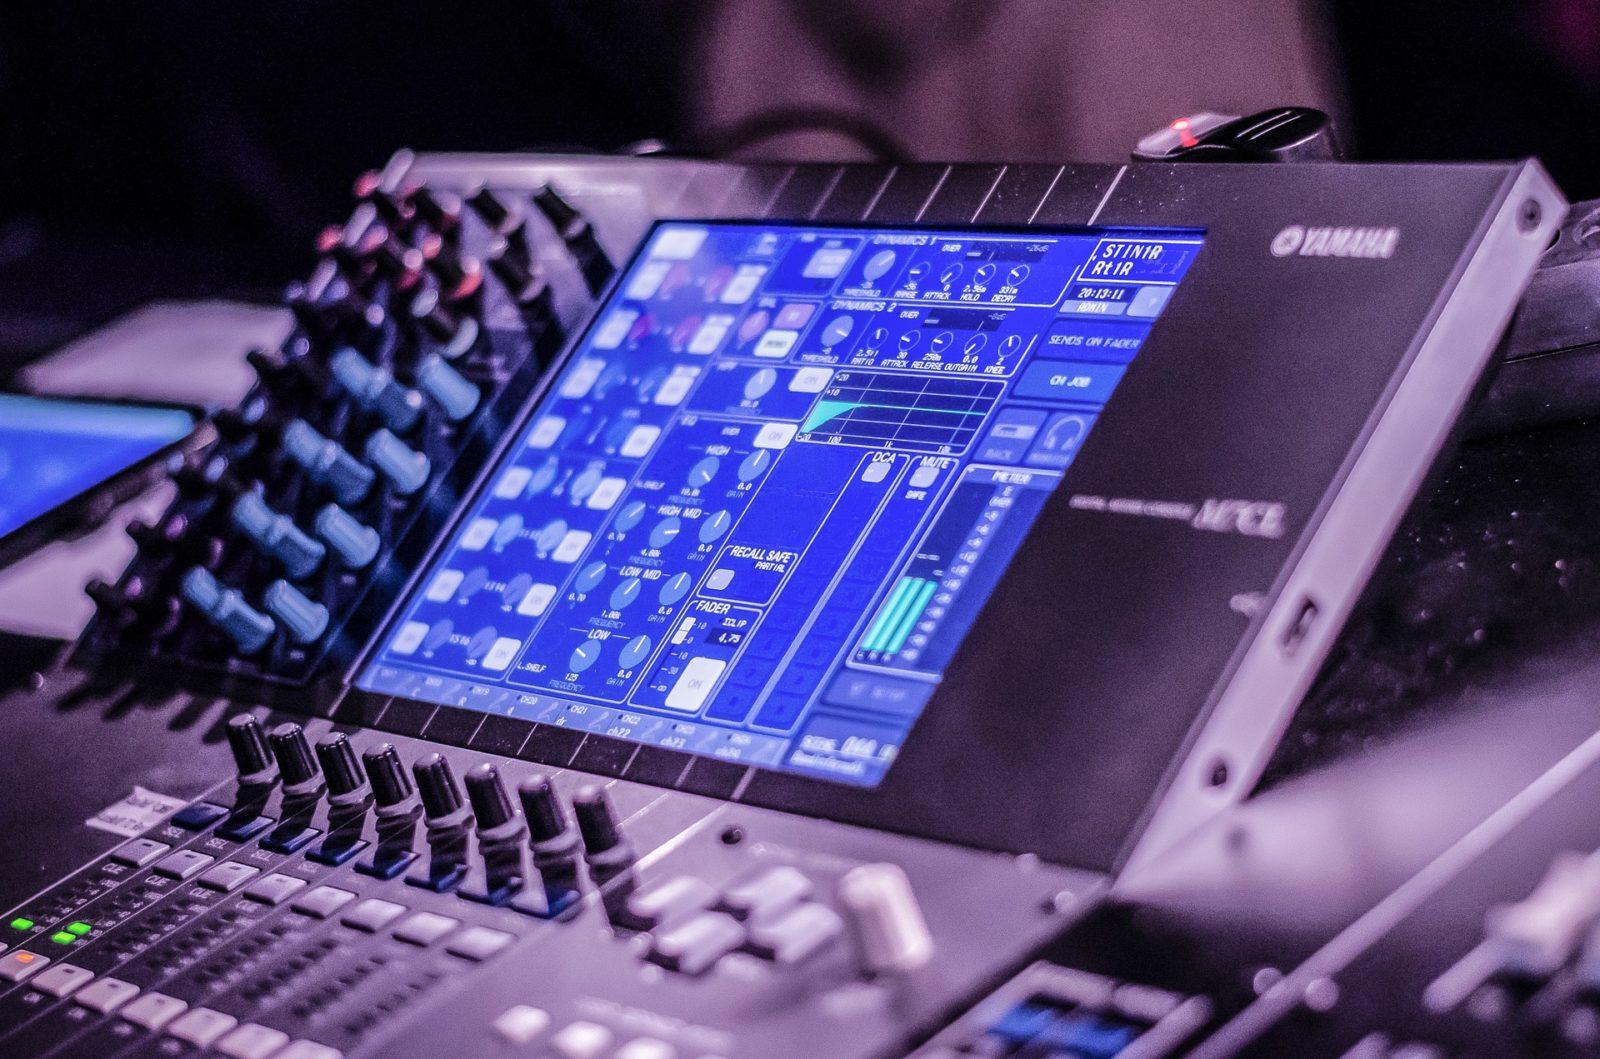 digital audio mixer display screen